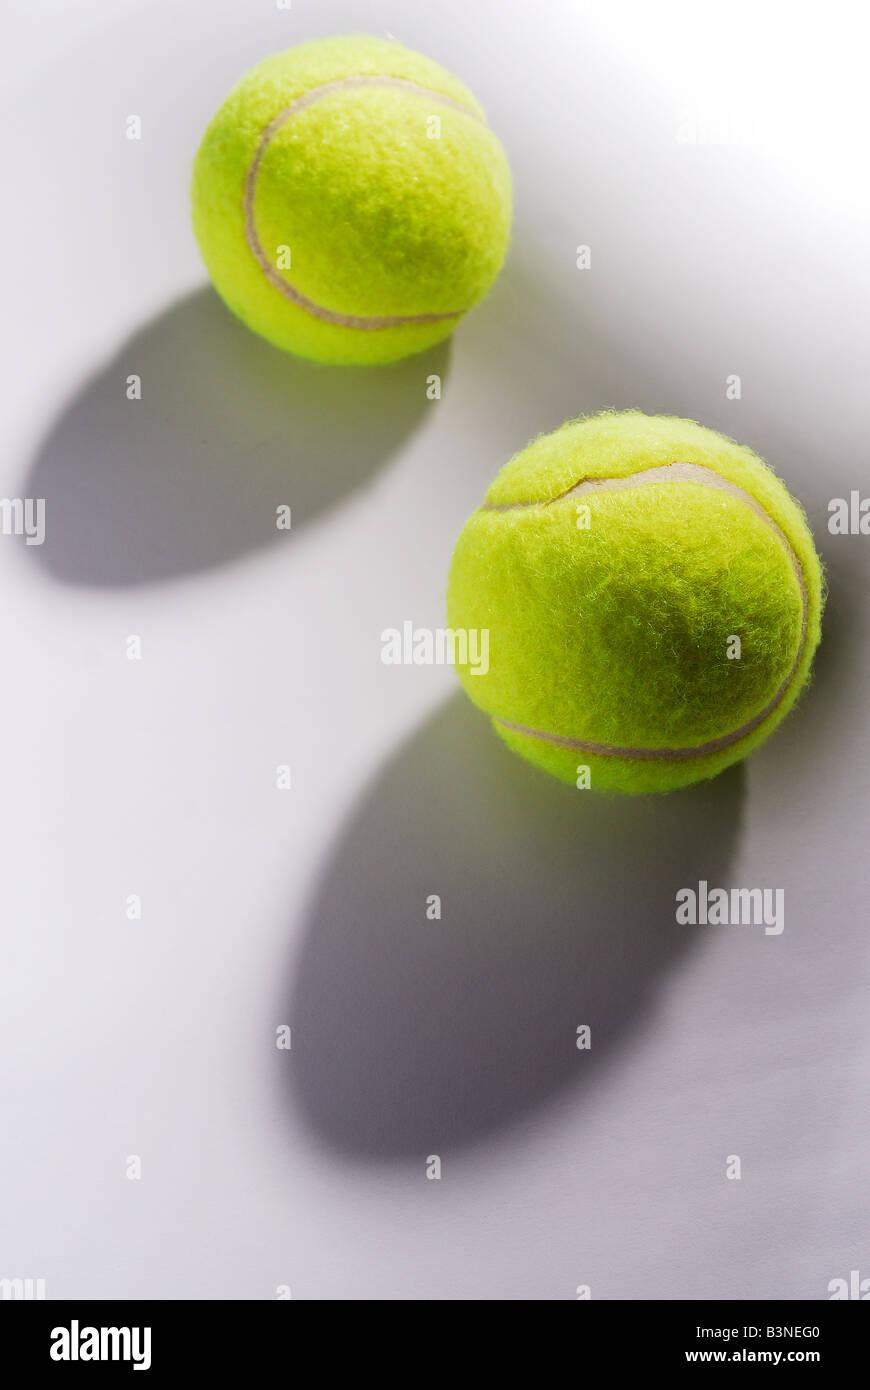 tennis ball2 - Stock Image